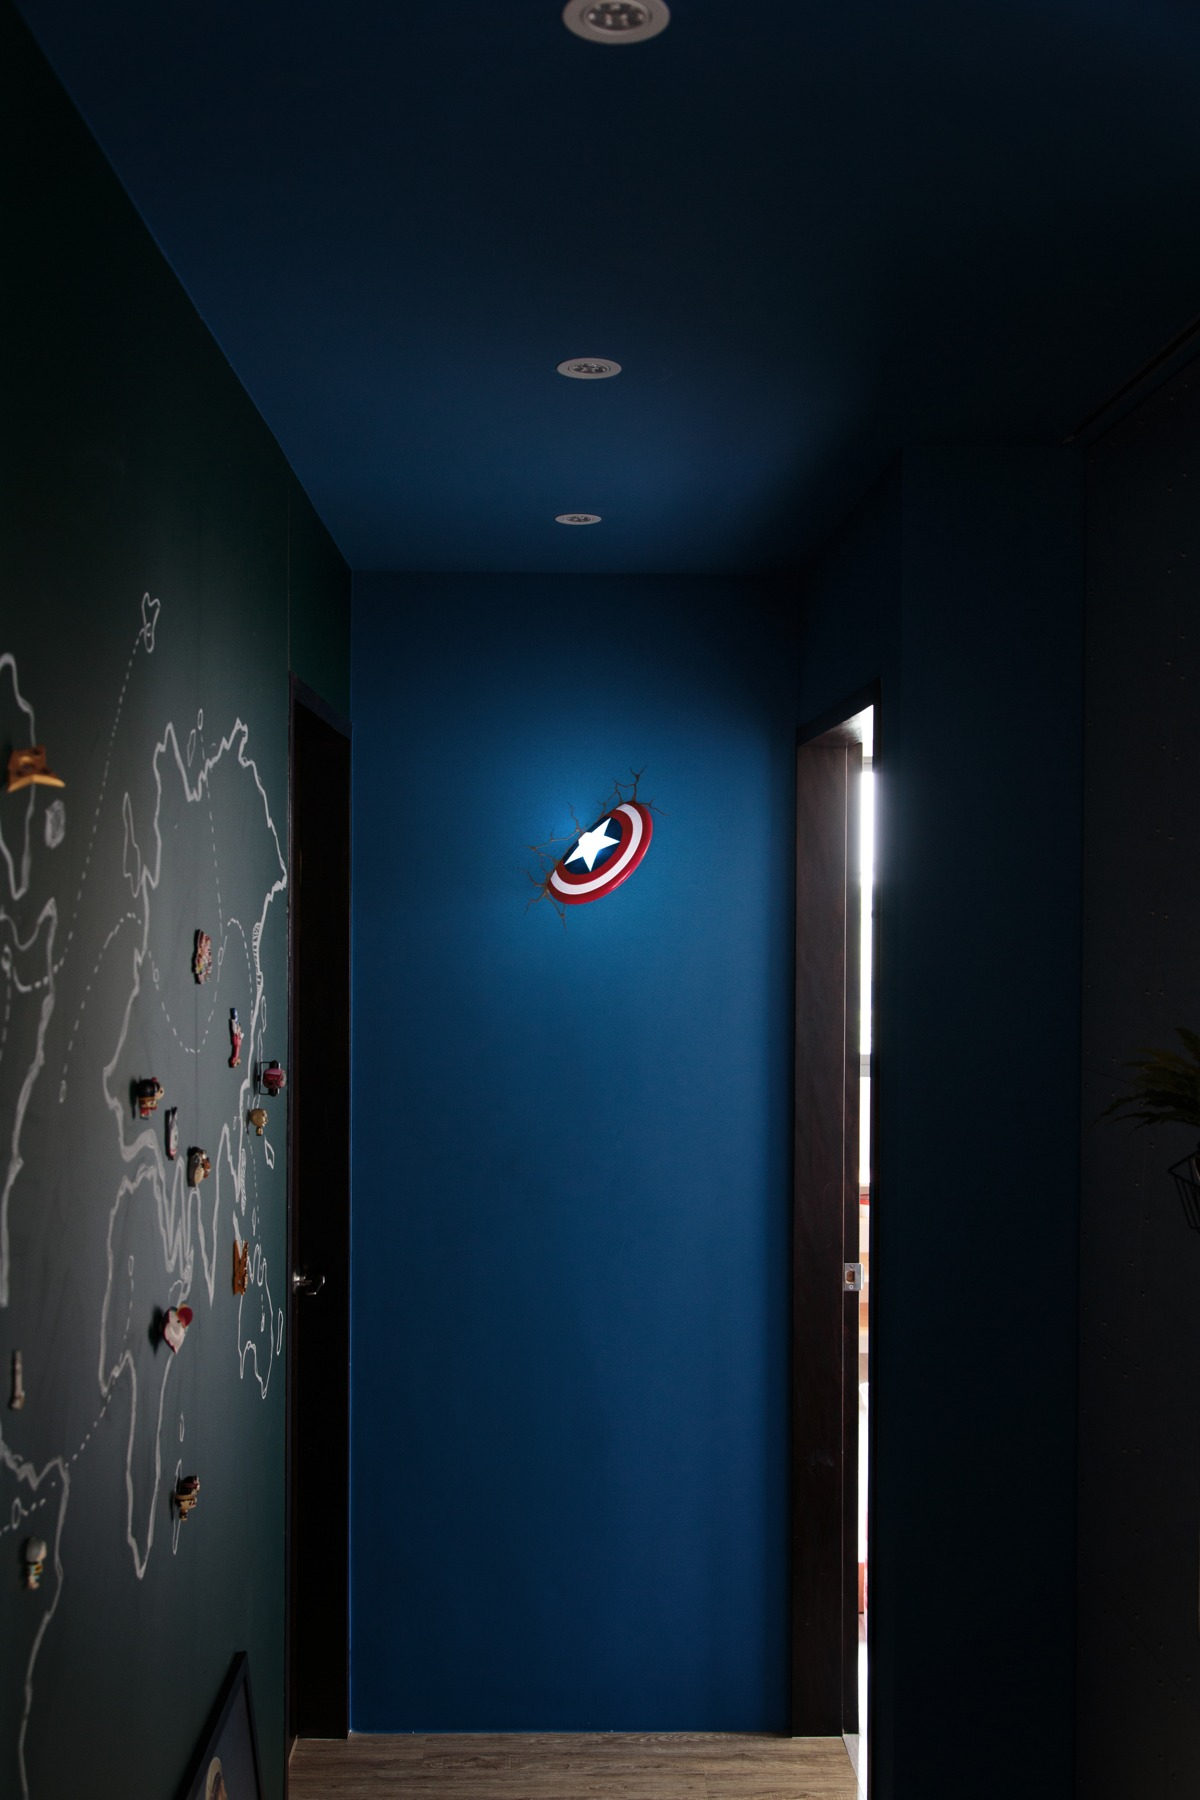 Unique apartment designs ideas with superhero decor for Superhero bedroom decor